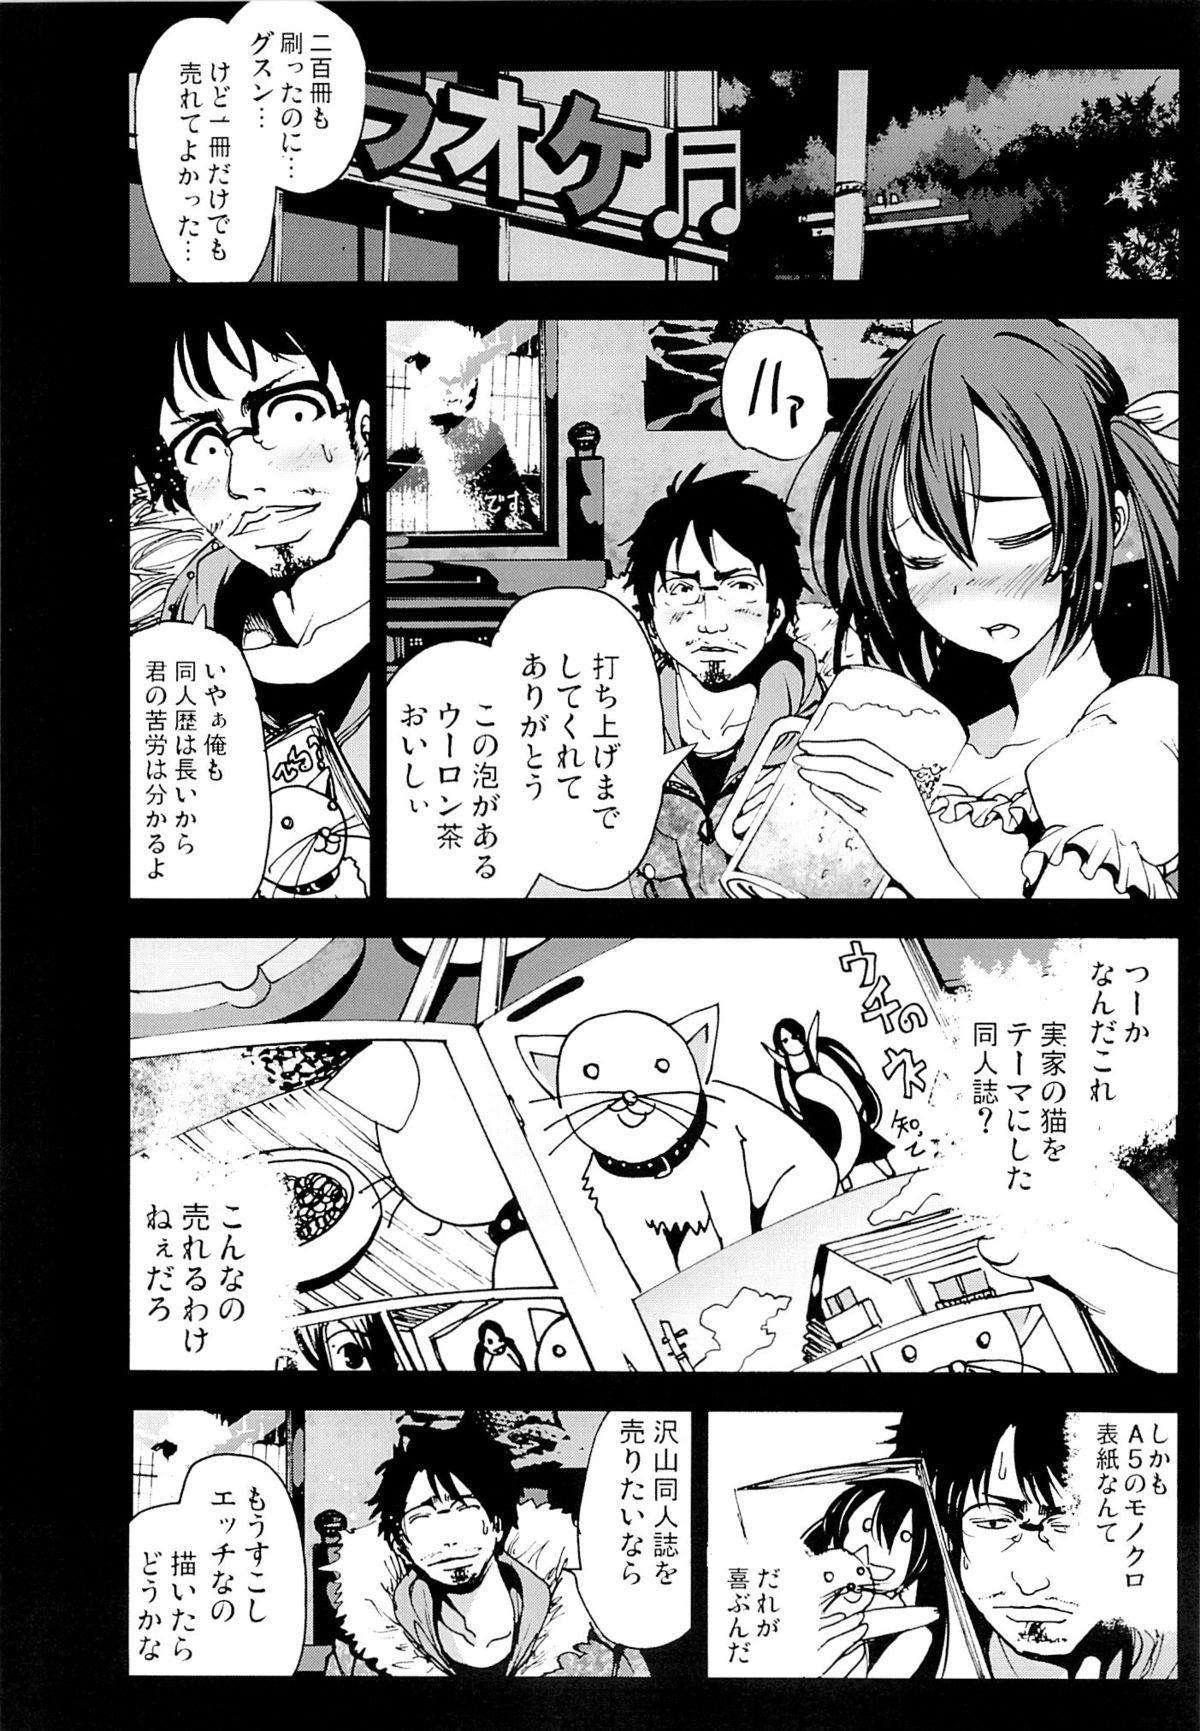 H na Doujinshi no Kakikata 6